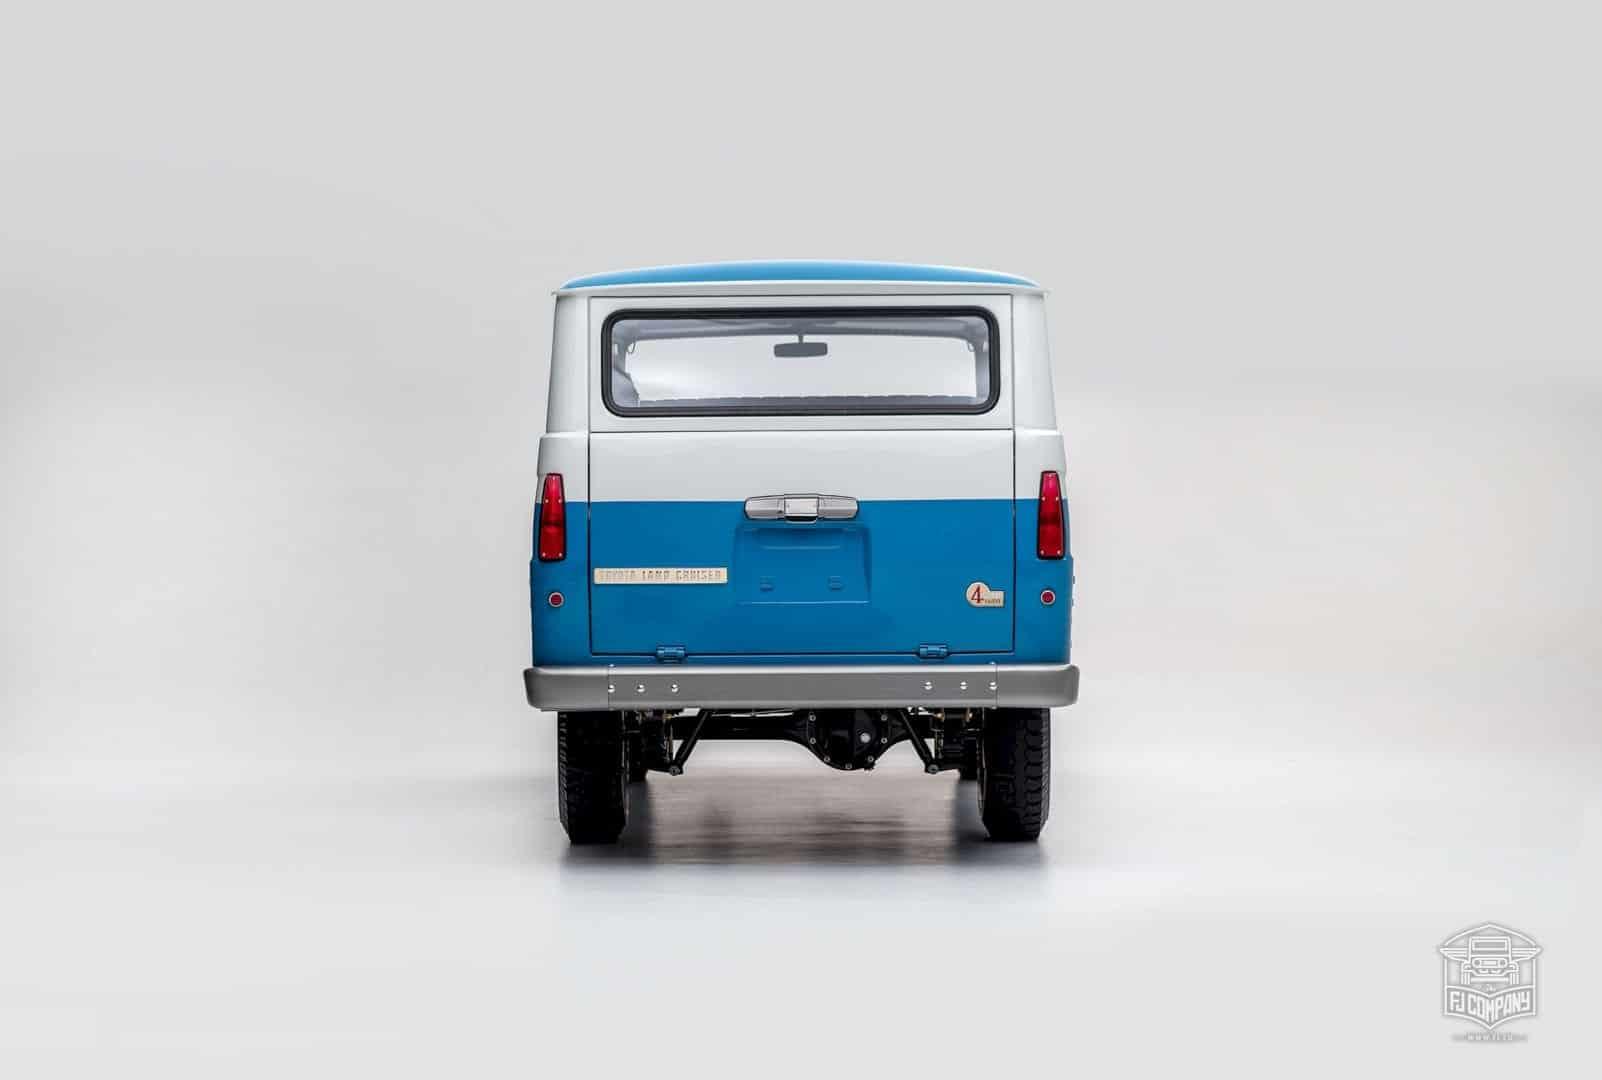 1967 Toyota Land Cruiser Fj45lv Capri Blue 6